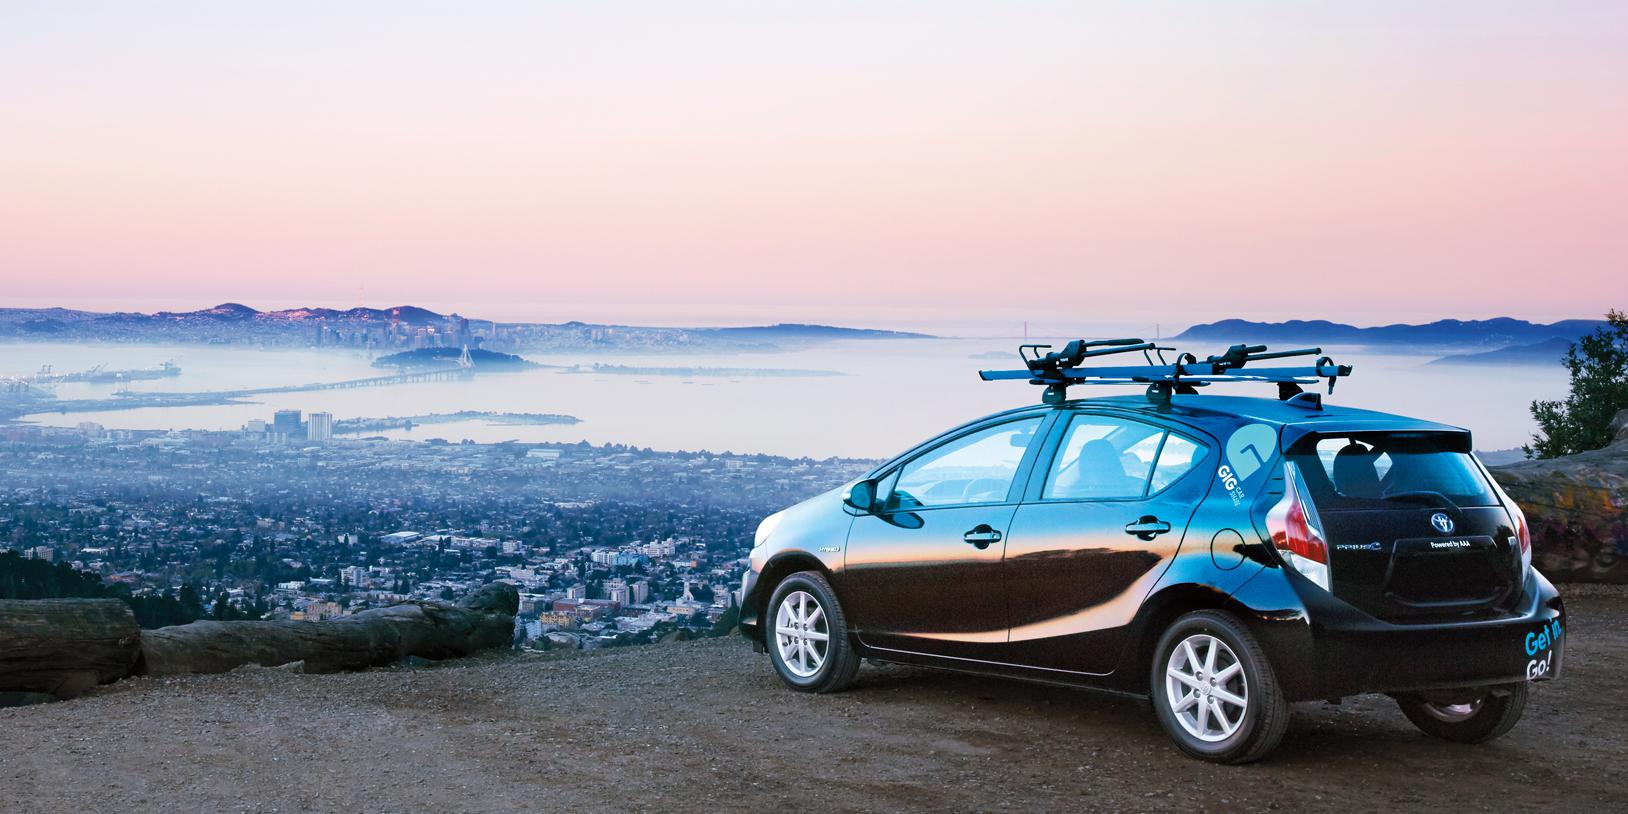 Gig Car Overlooking The San Francisco Bay Area Photo